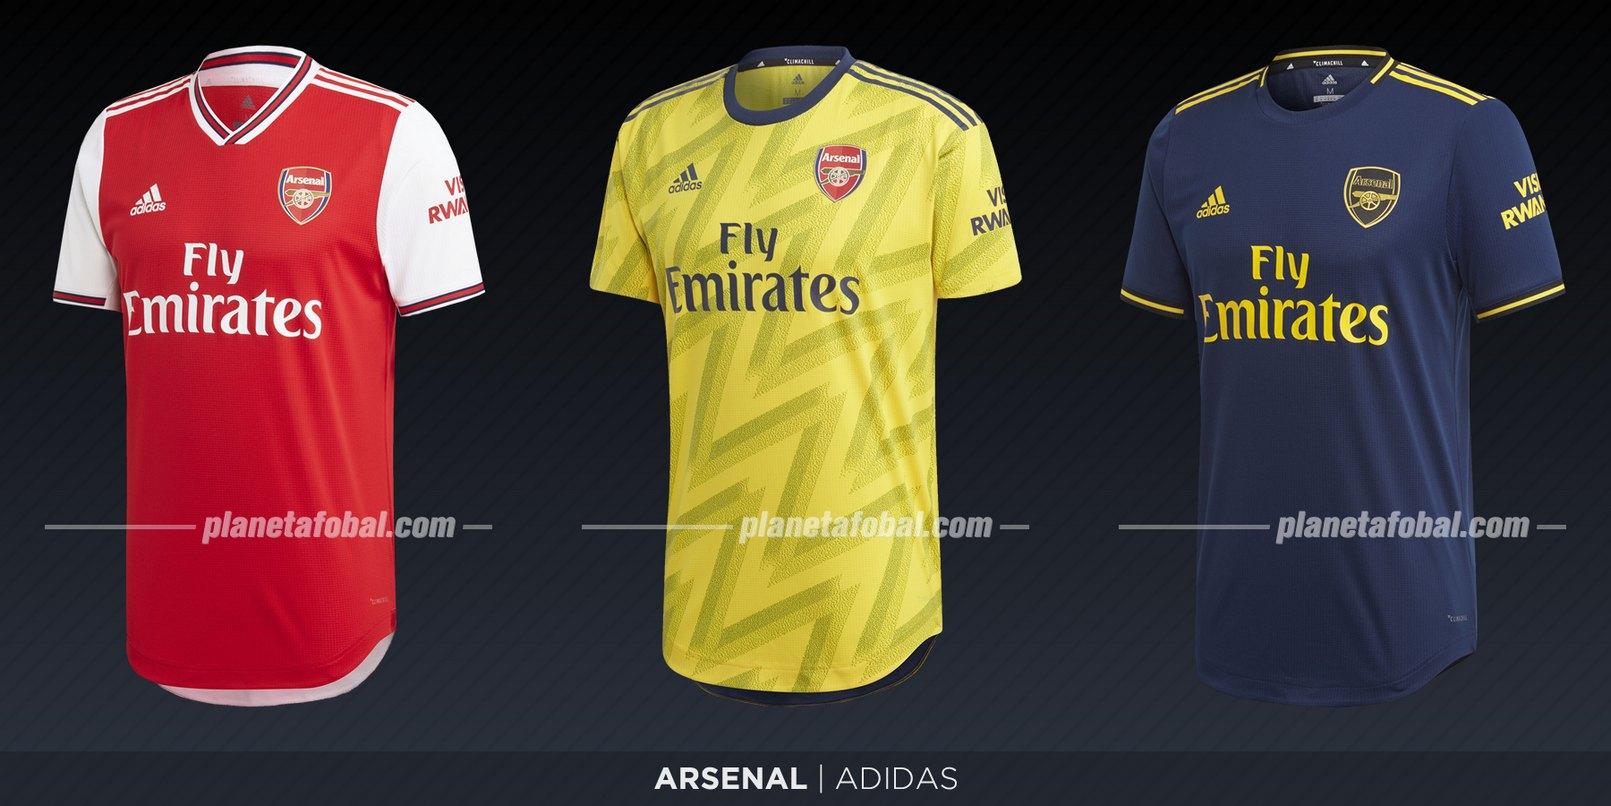 Arsenal (Adidas) | Camisetas de la Premier League 2019-2020